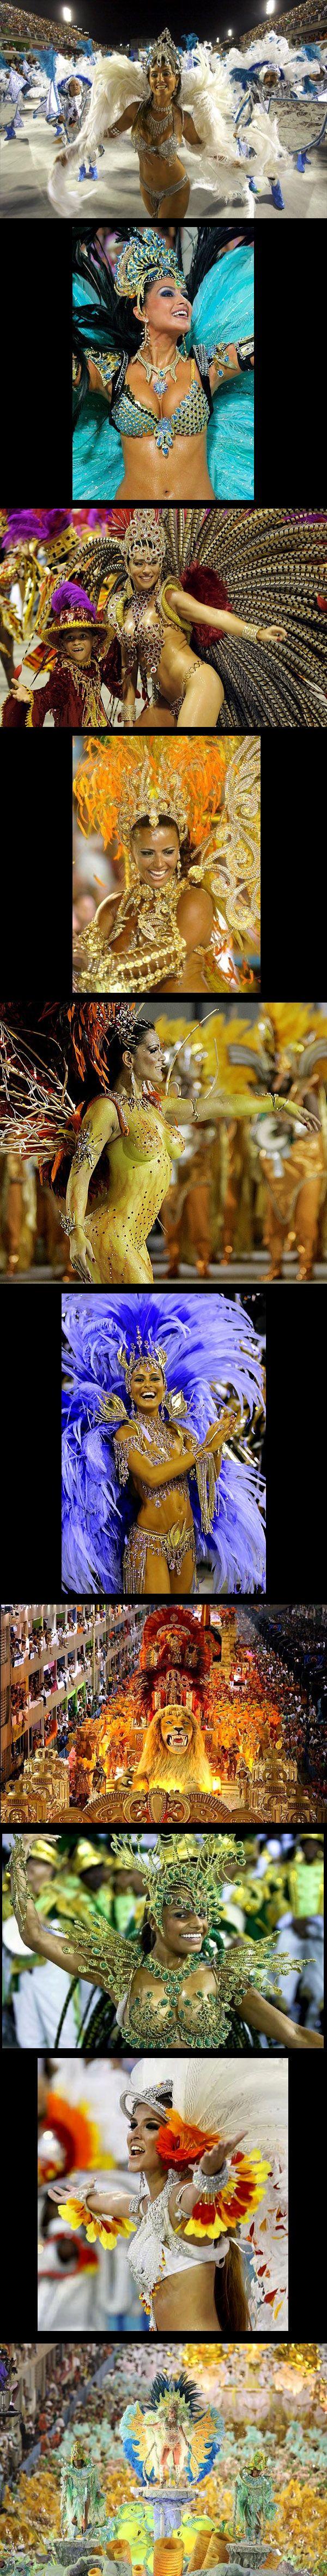 Rio de Janeiro, Brazil: Carnaval (the Portuguese spelling for carnival)